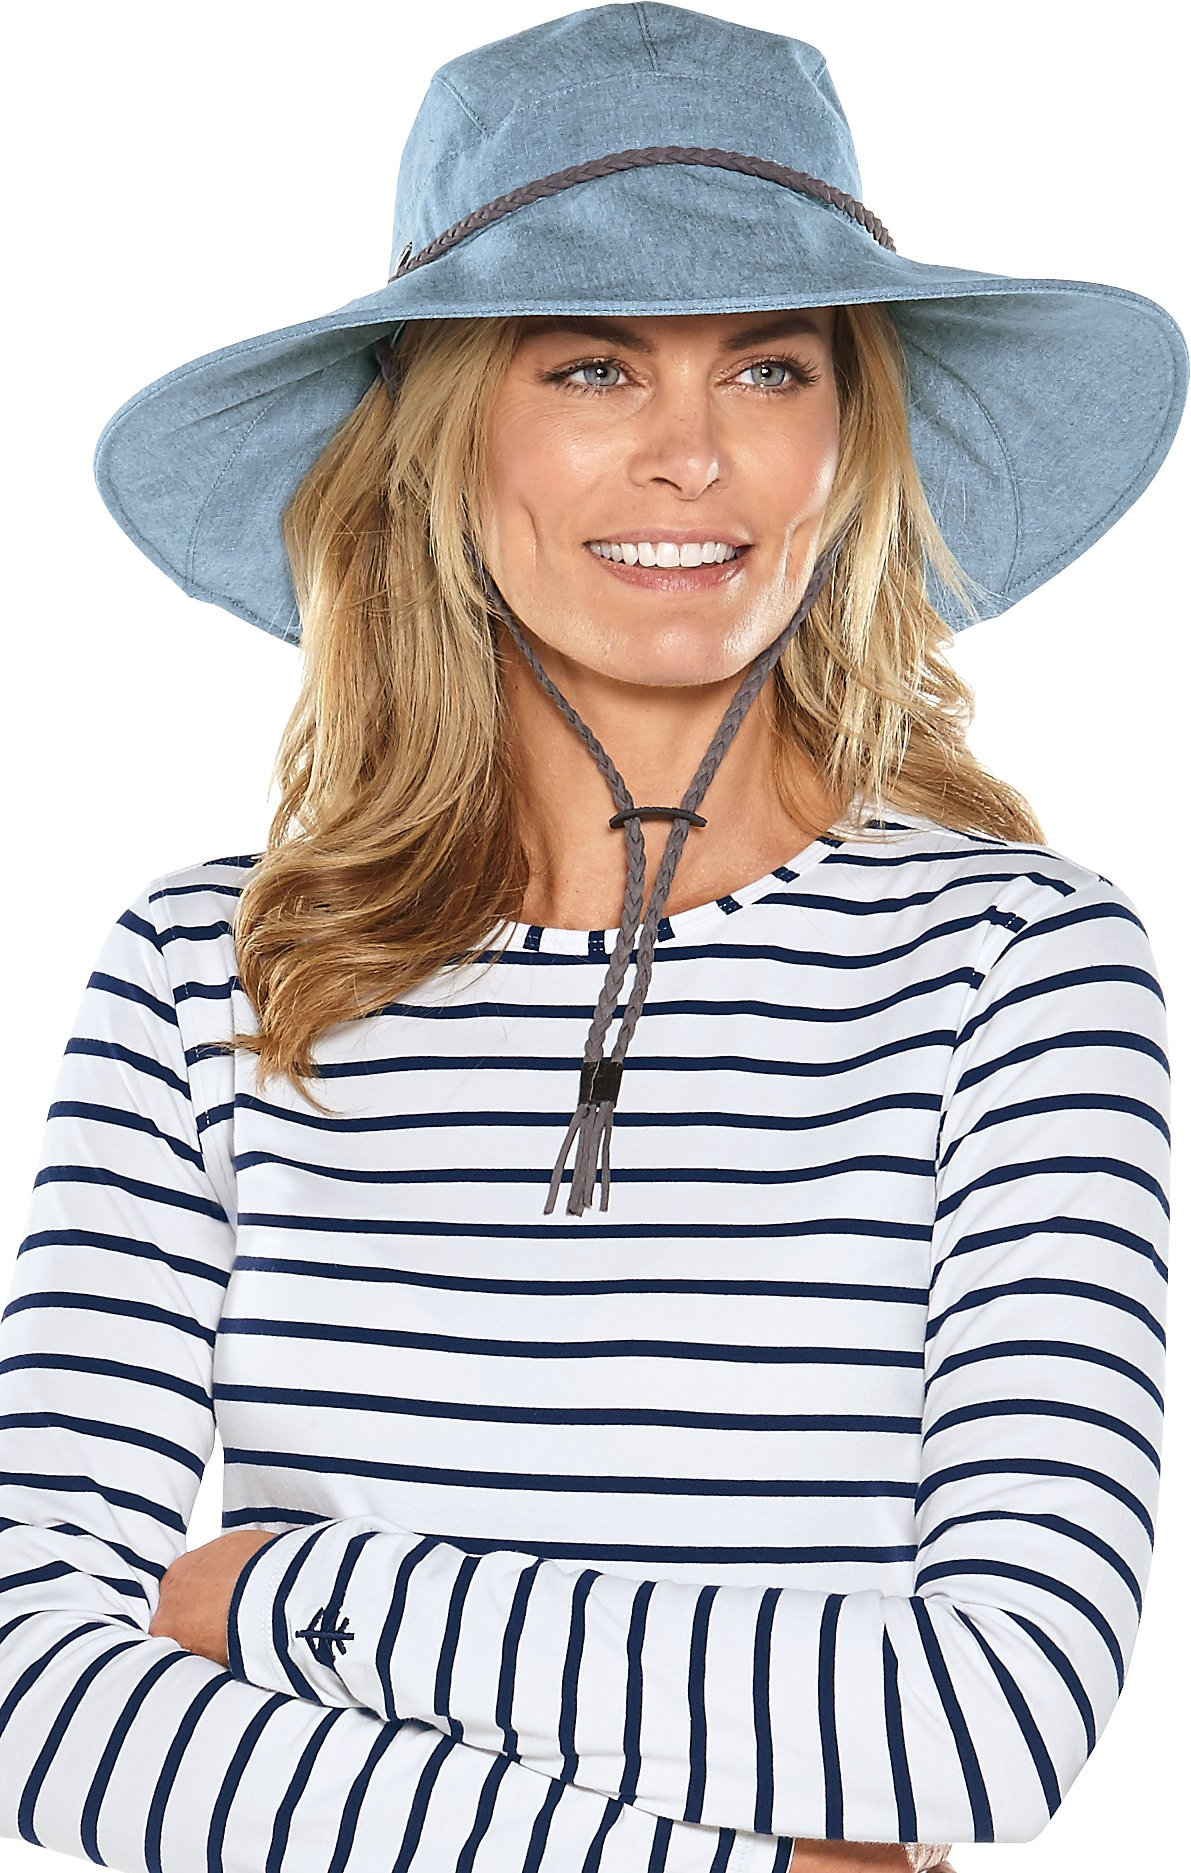 Coolibar UPF 50+ Women's Gardening Hat - Sun Protective (Large/X-Large- Chambray)